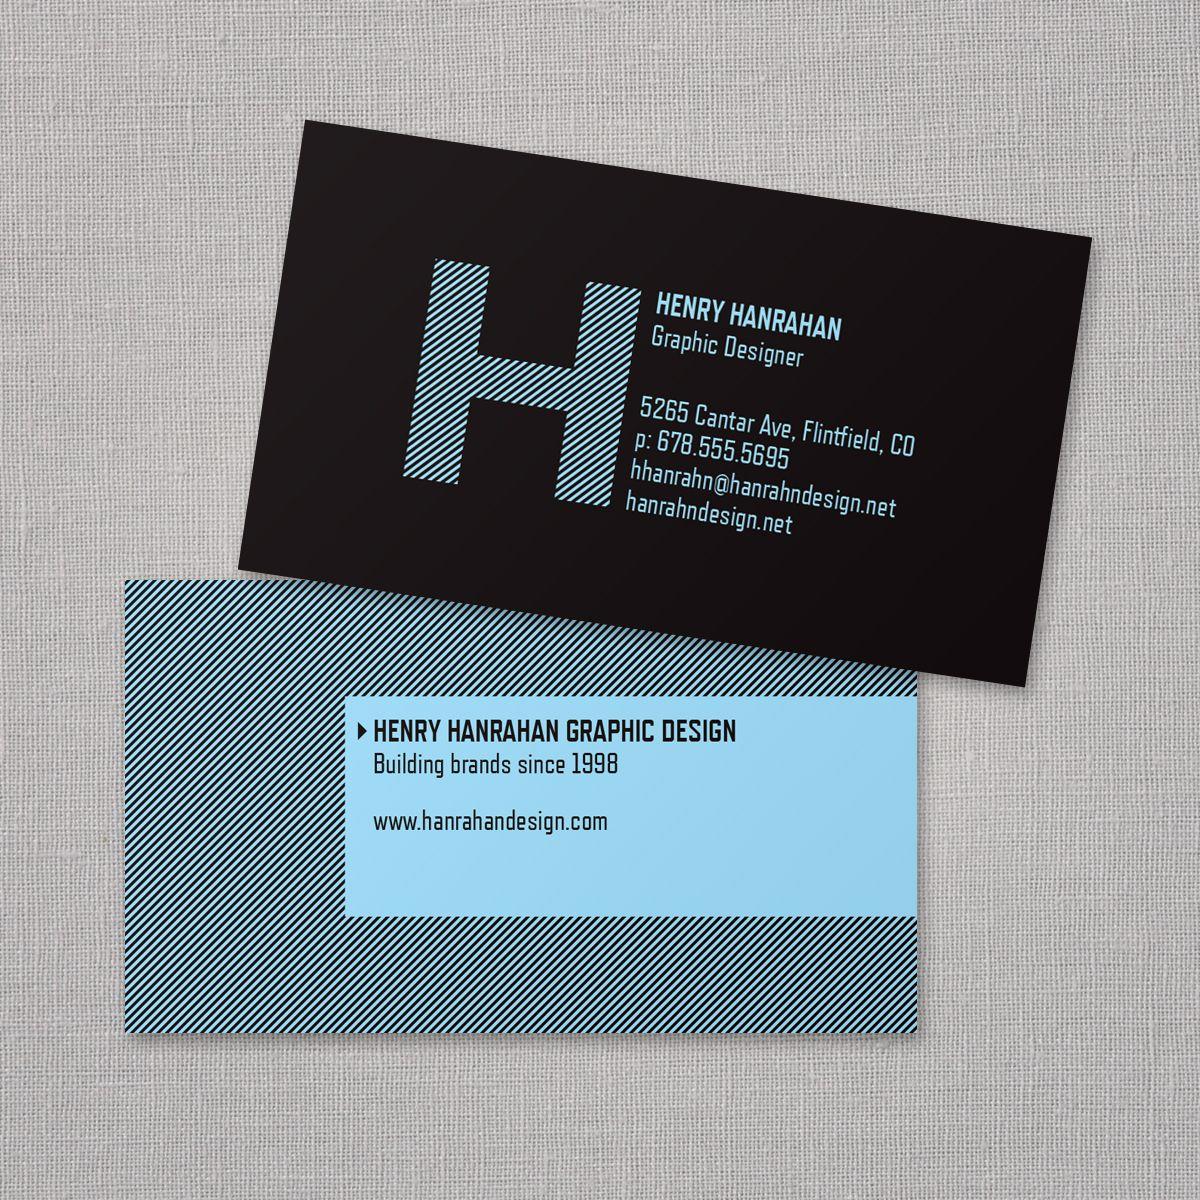 Vistaprint Promo Code For 500 Business Cards | Handmade ...